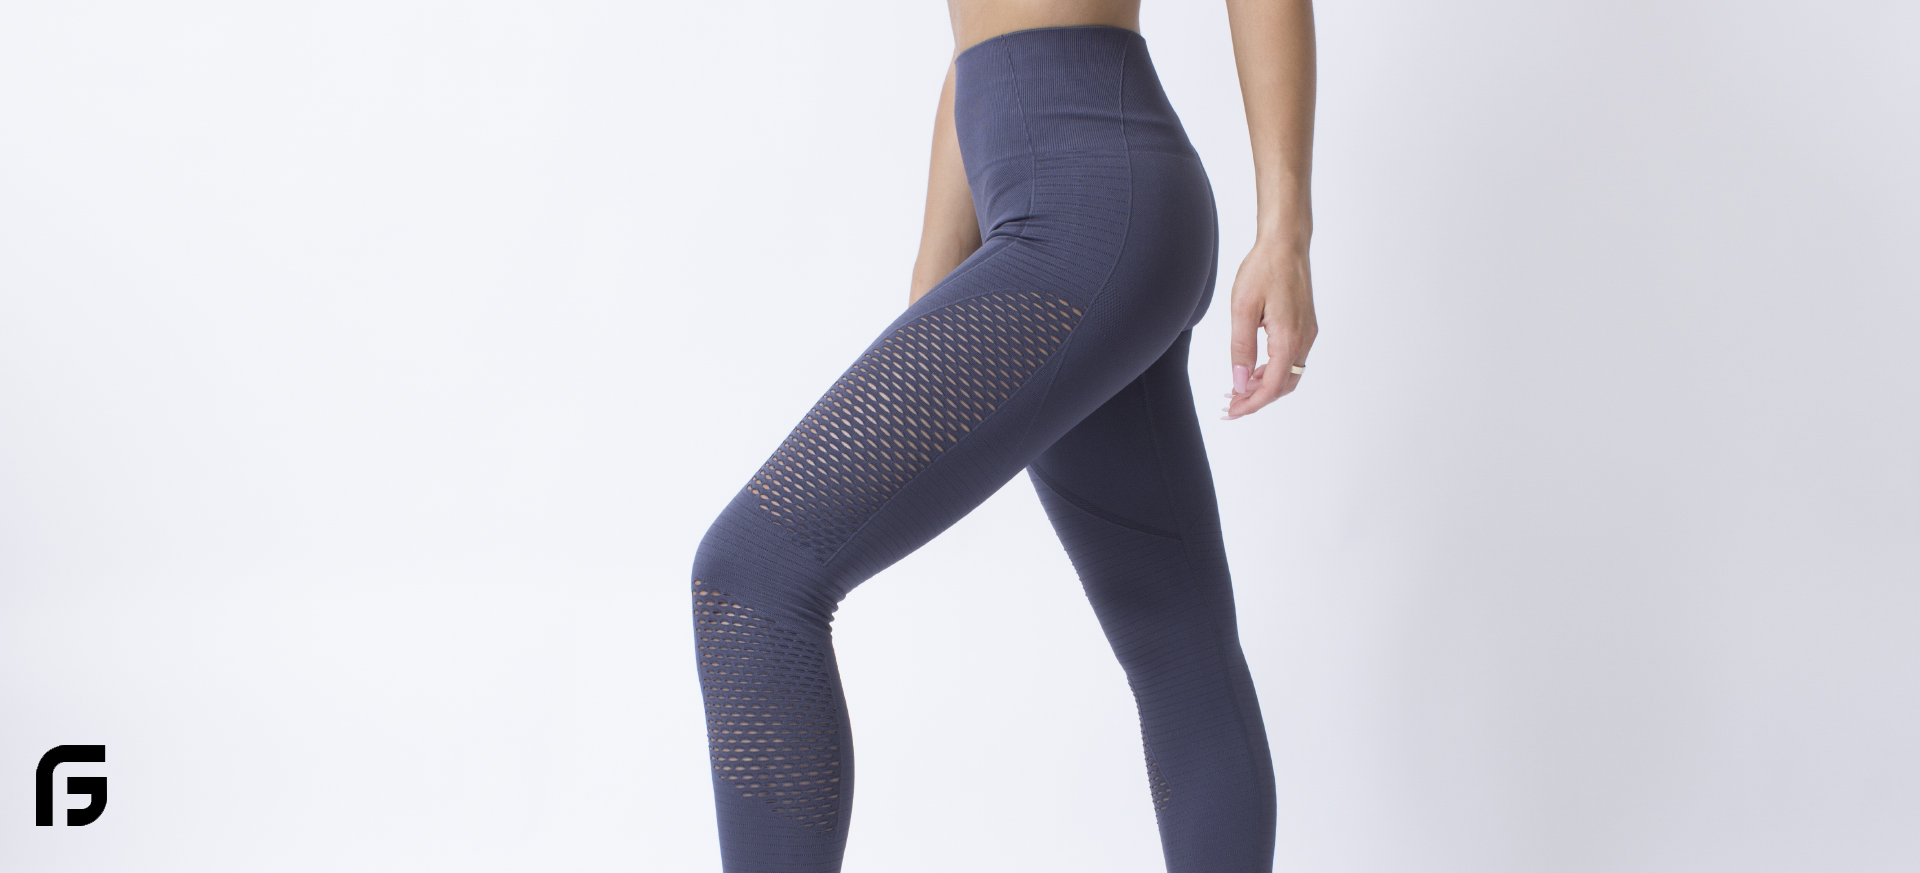 workout leggings canada